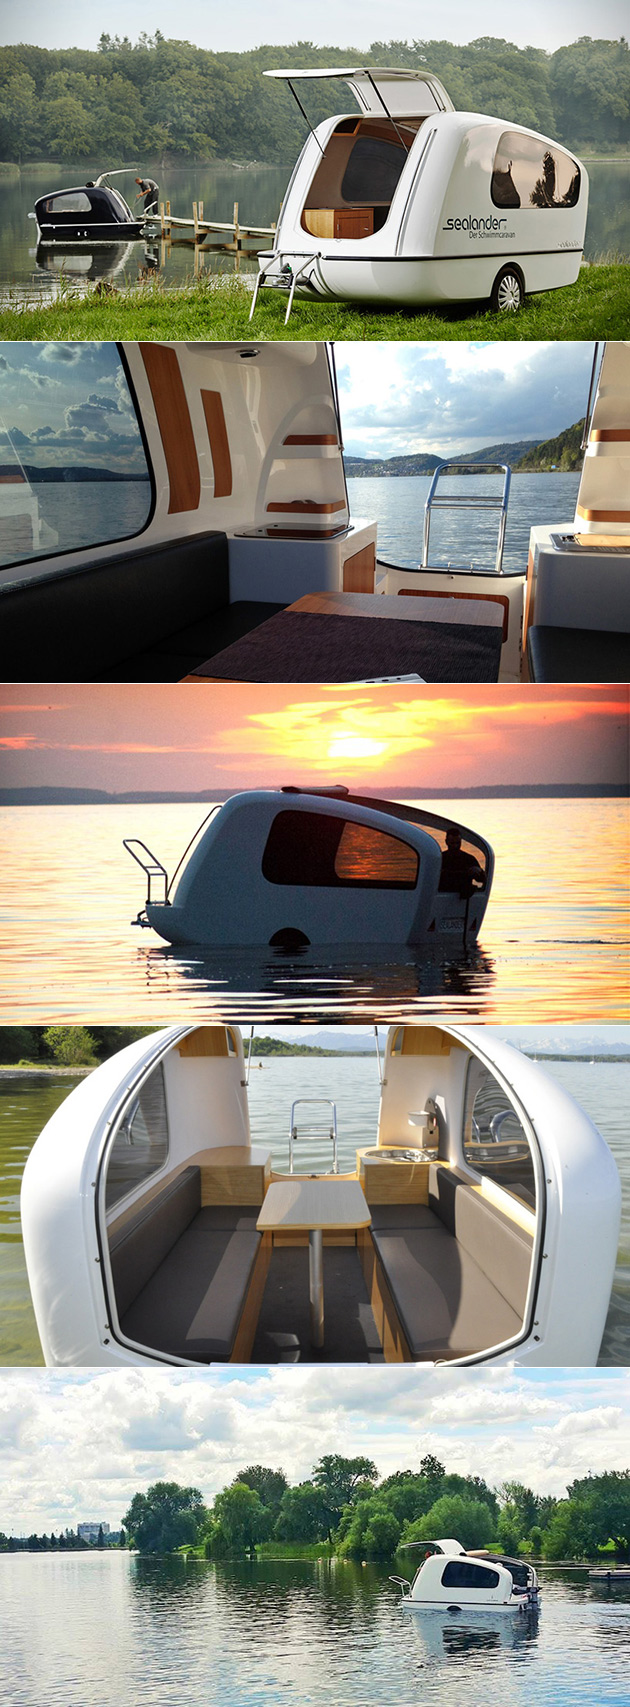 Sealander Amphibious Caravan